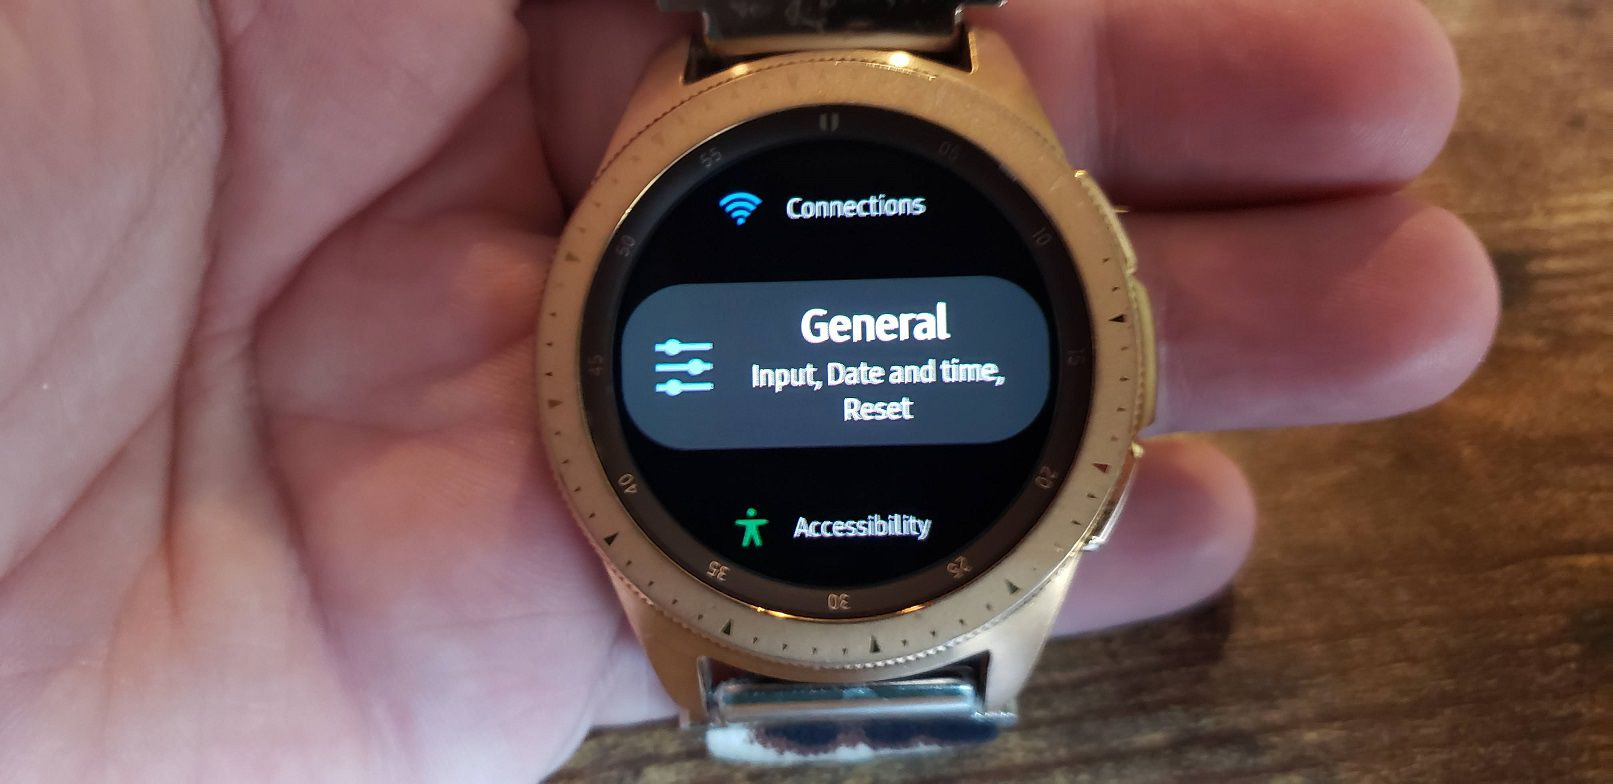 Samsung Galaxy Watch Settings and General sub menu.